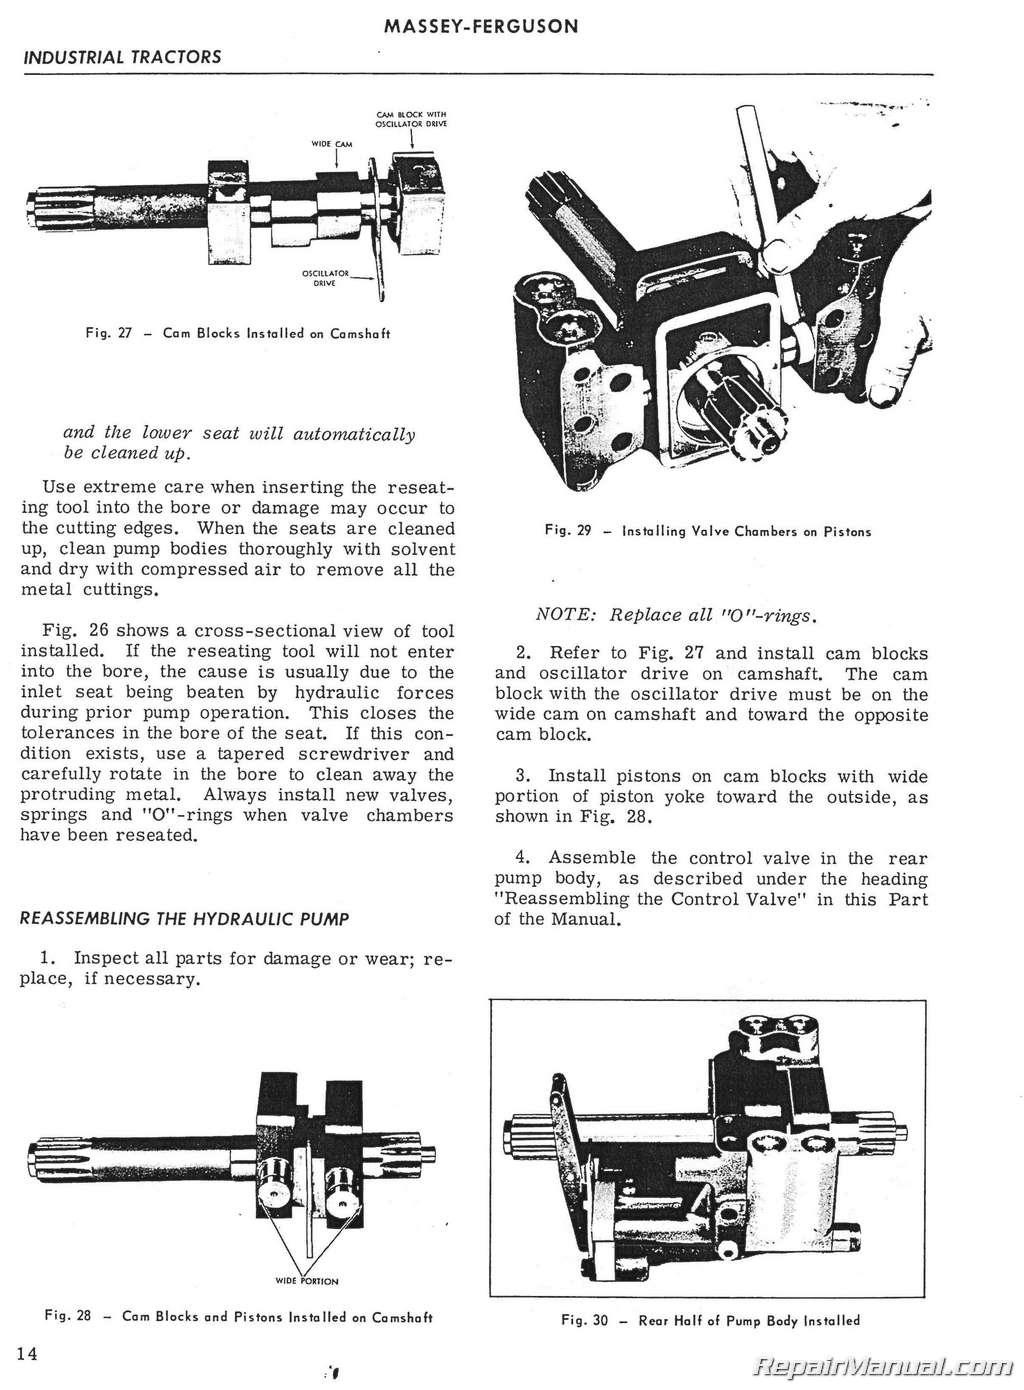 Massey Ferguson 471 Owners Manual